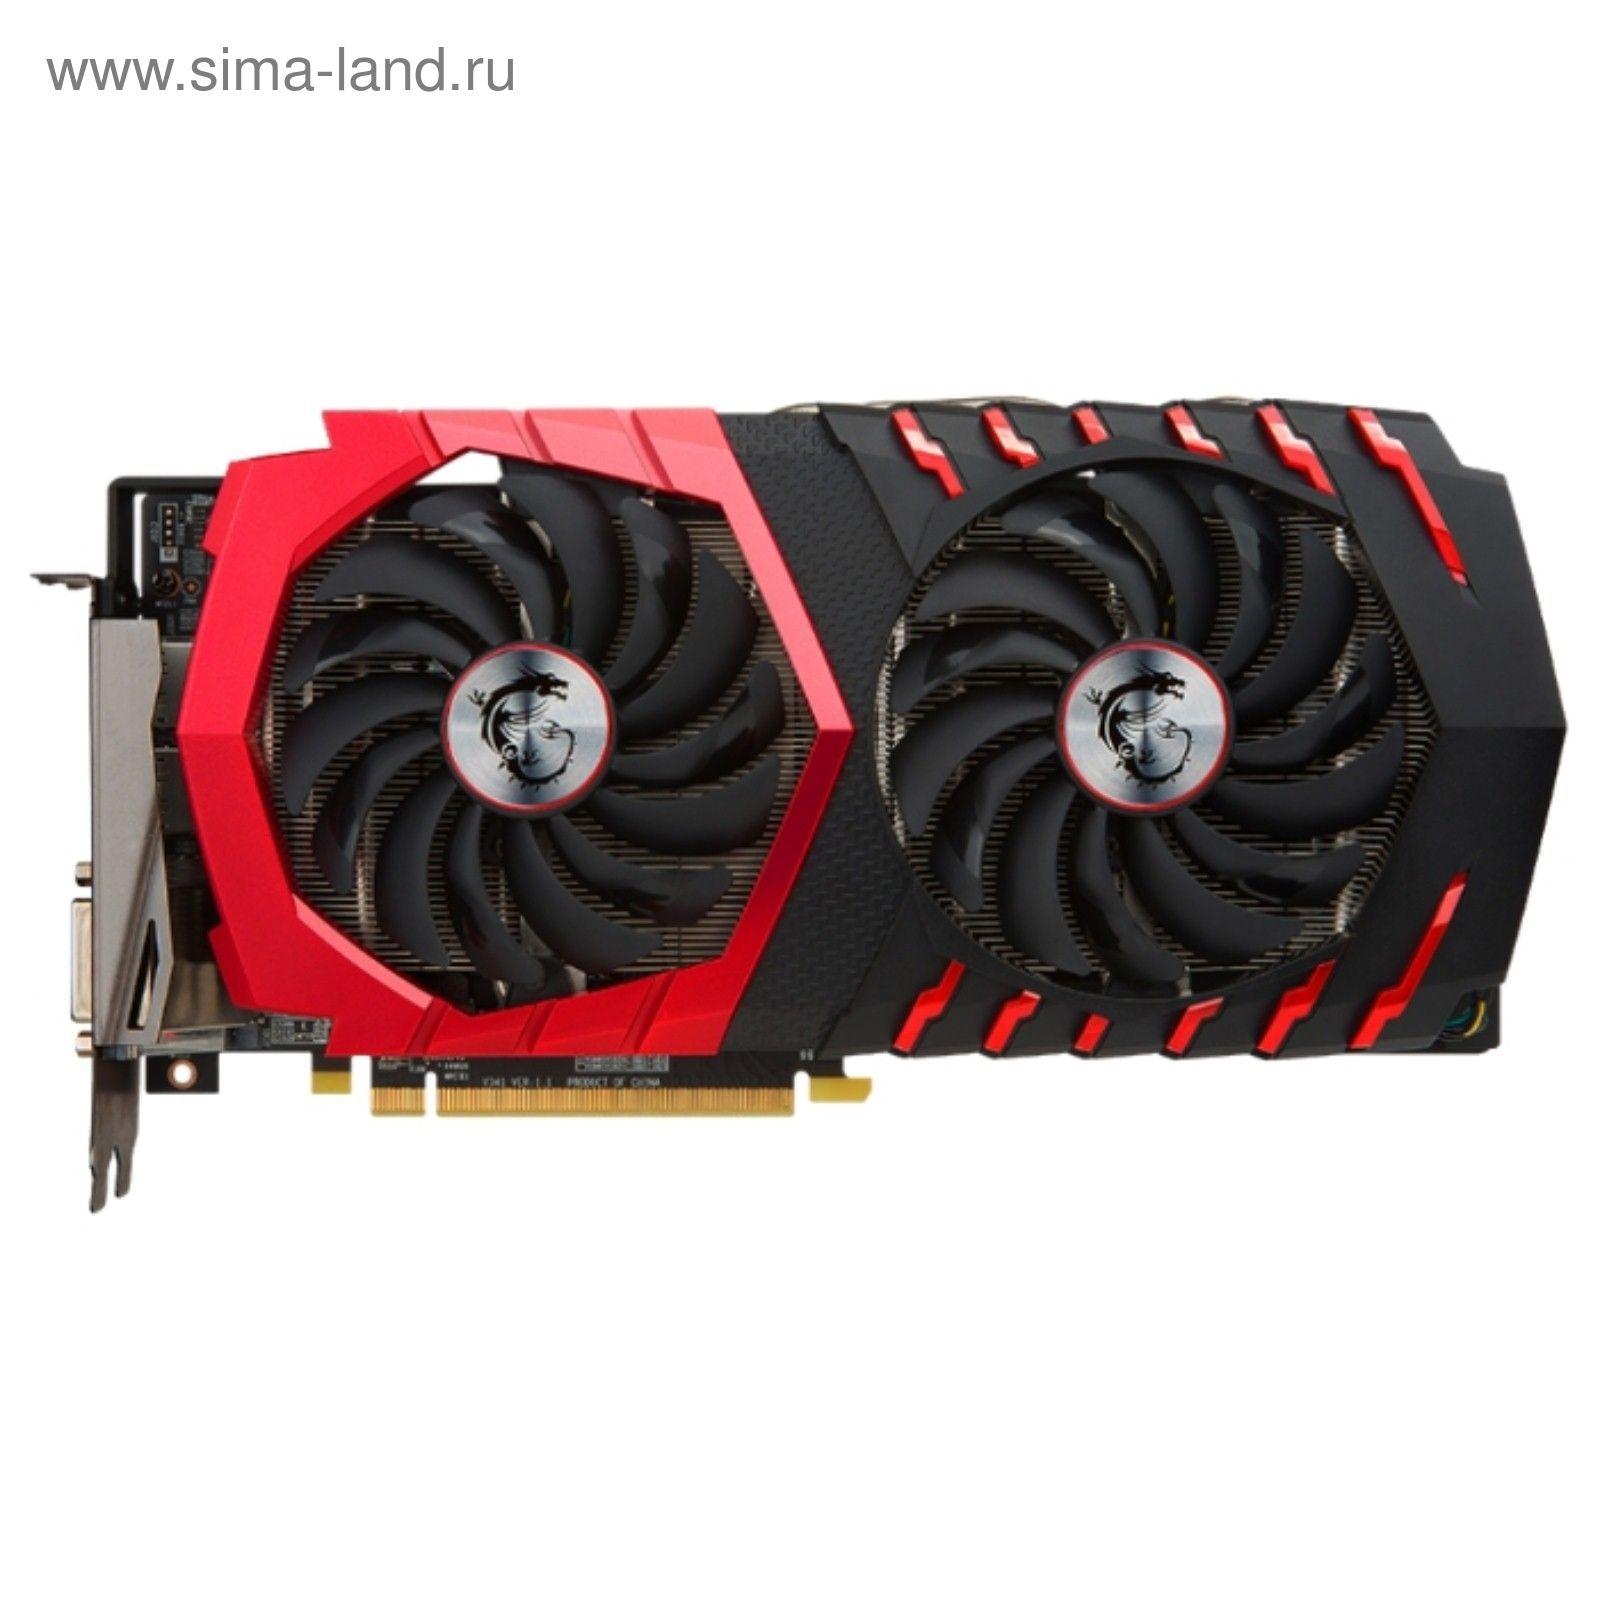 Видеокарта MSI AMD Radeon RX 580 GAMING 8G,256bit,GDDR5,1353/8000